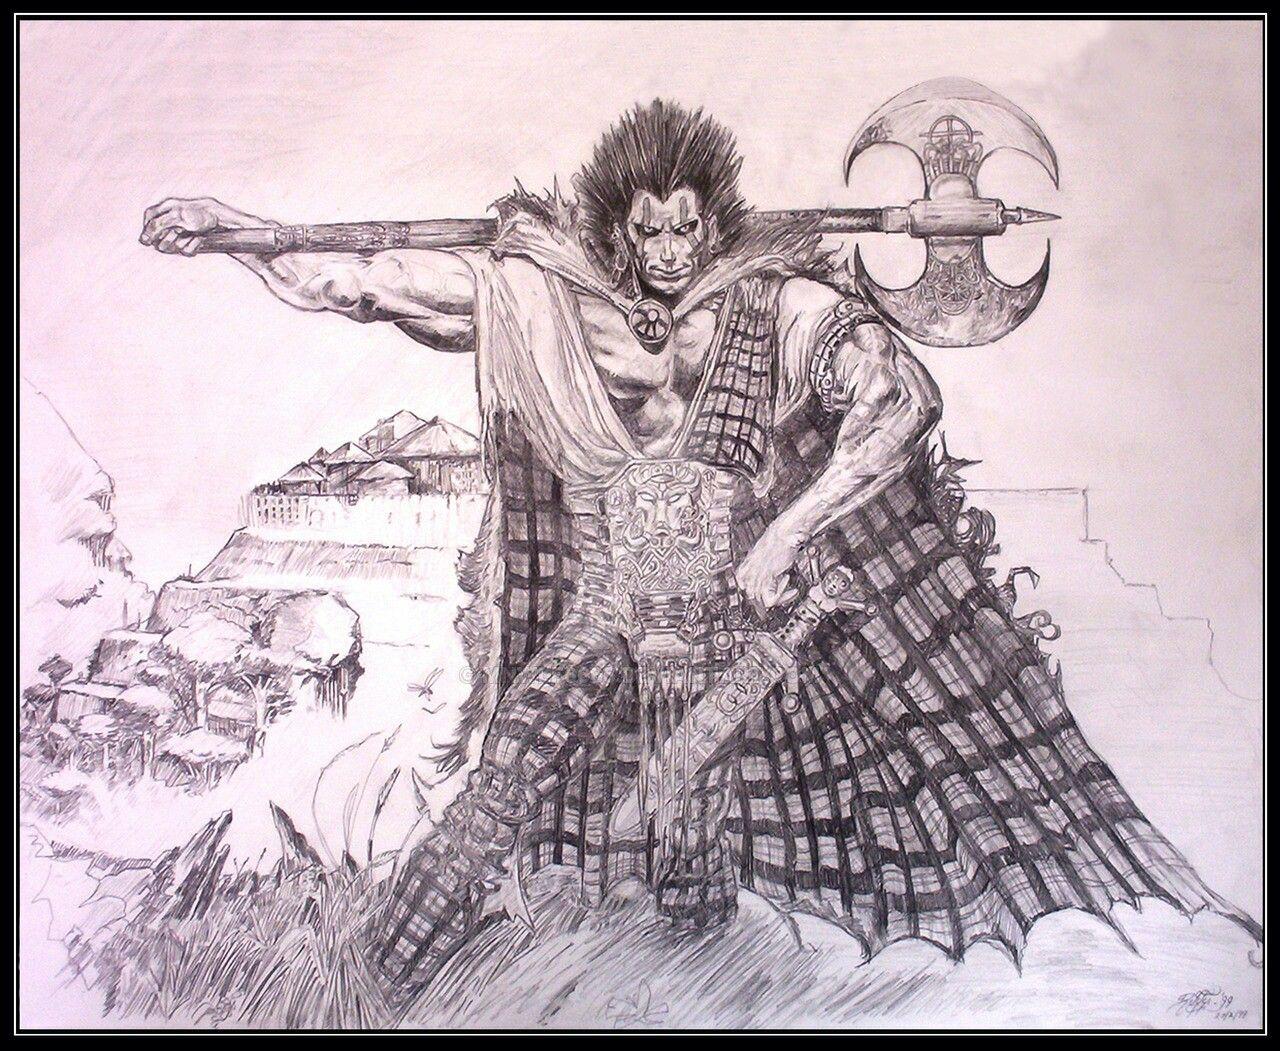 Fan 2000 Ad Image By Paul Sunderland Celtic Warriors Celtic Warrior Tattoos Art